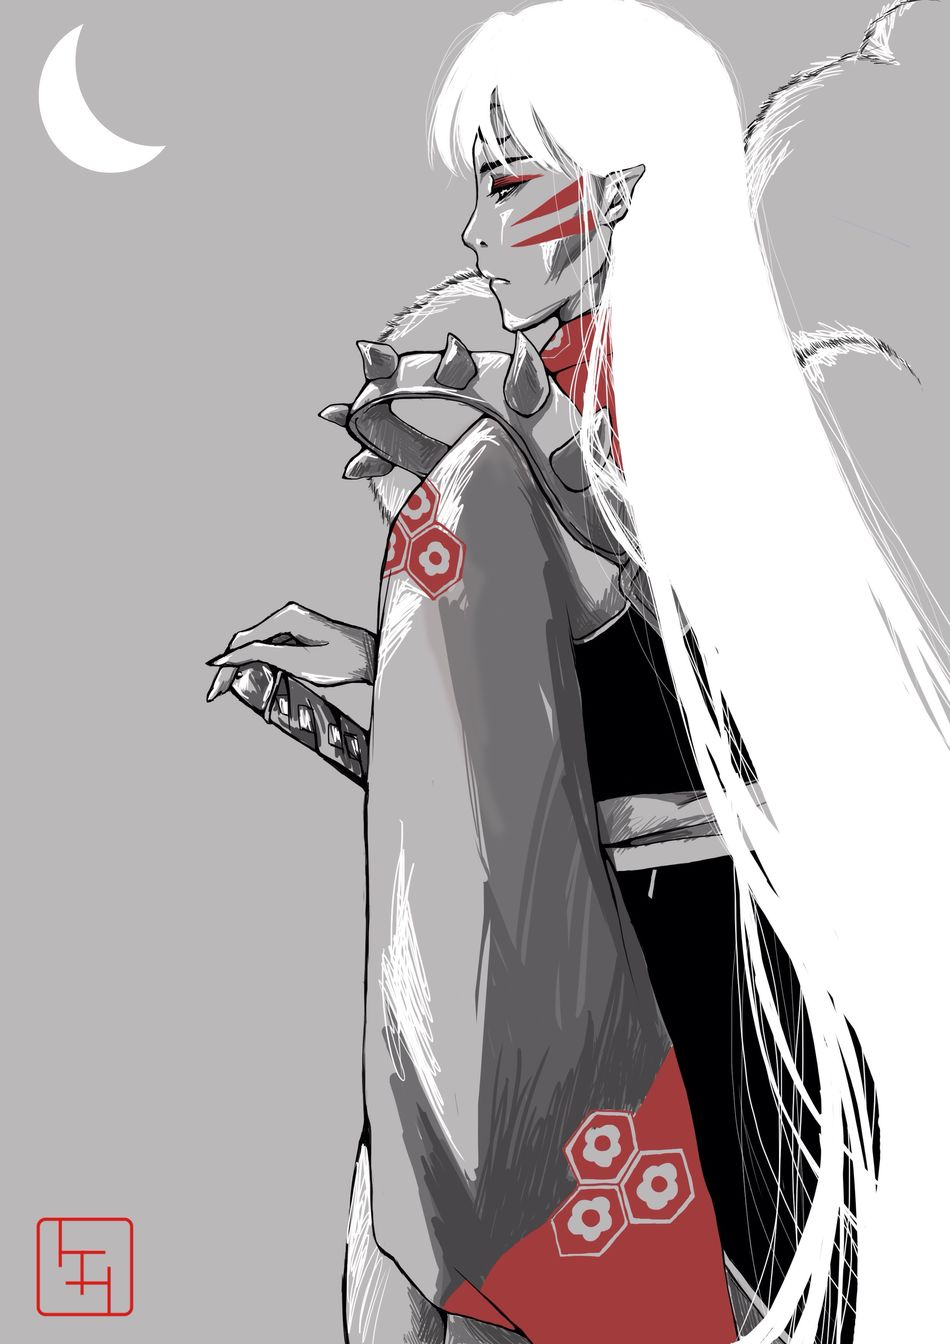 Art MyArt Anime Manga Inuyasha Fanart Digital Art My Art Sesshomaru